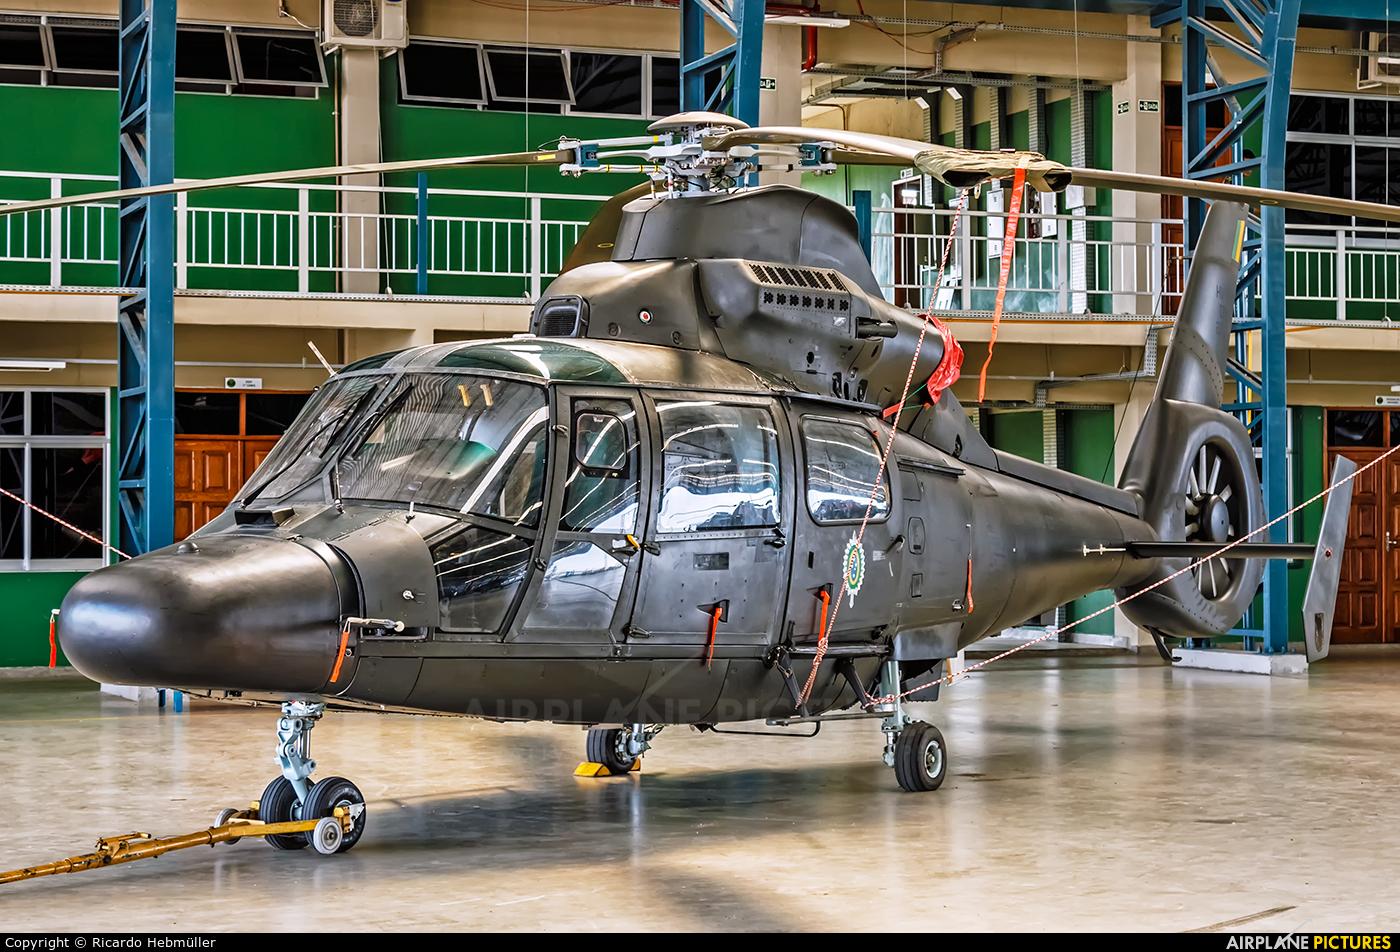 Brazil - Army - aircraft at Manaus - Ponta Pelada